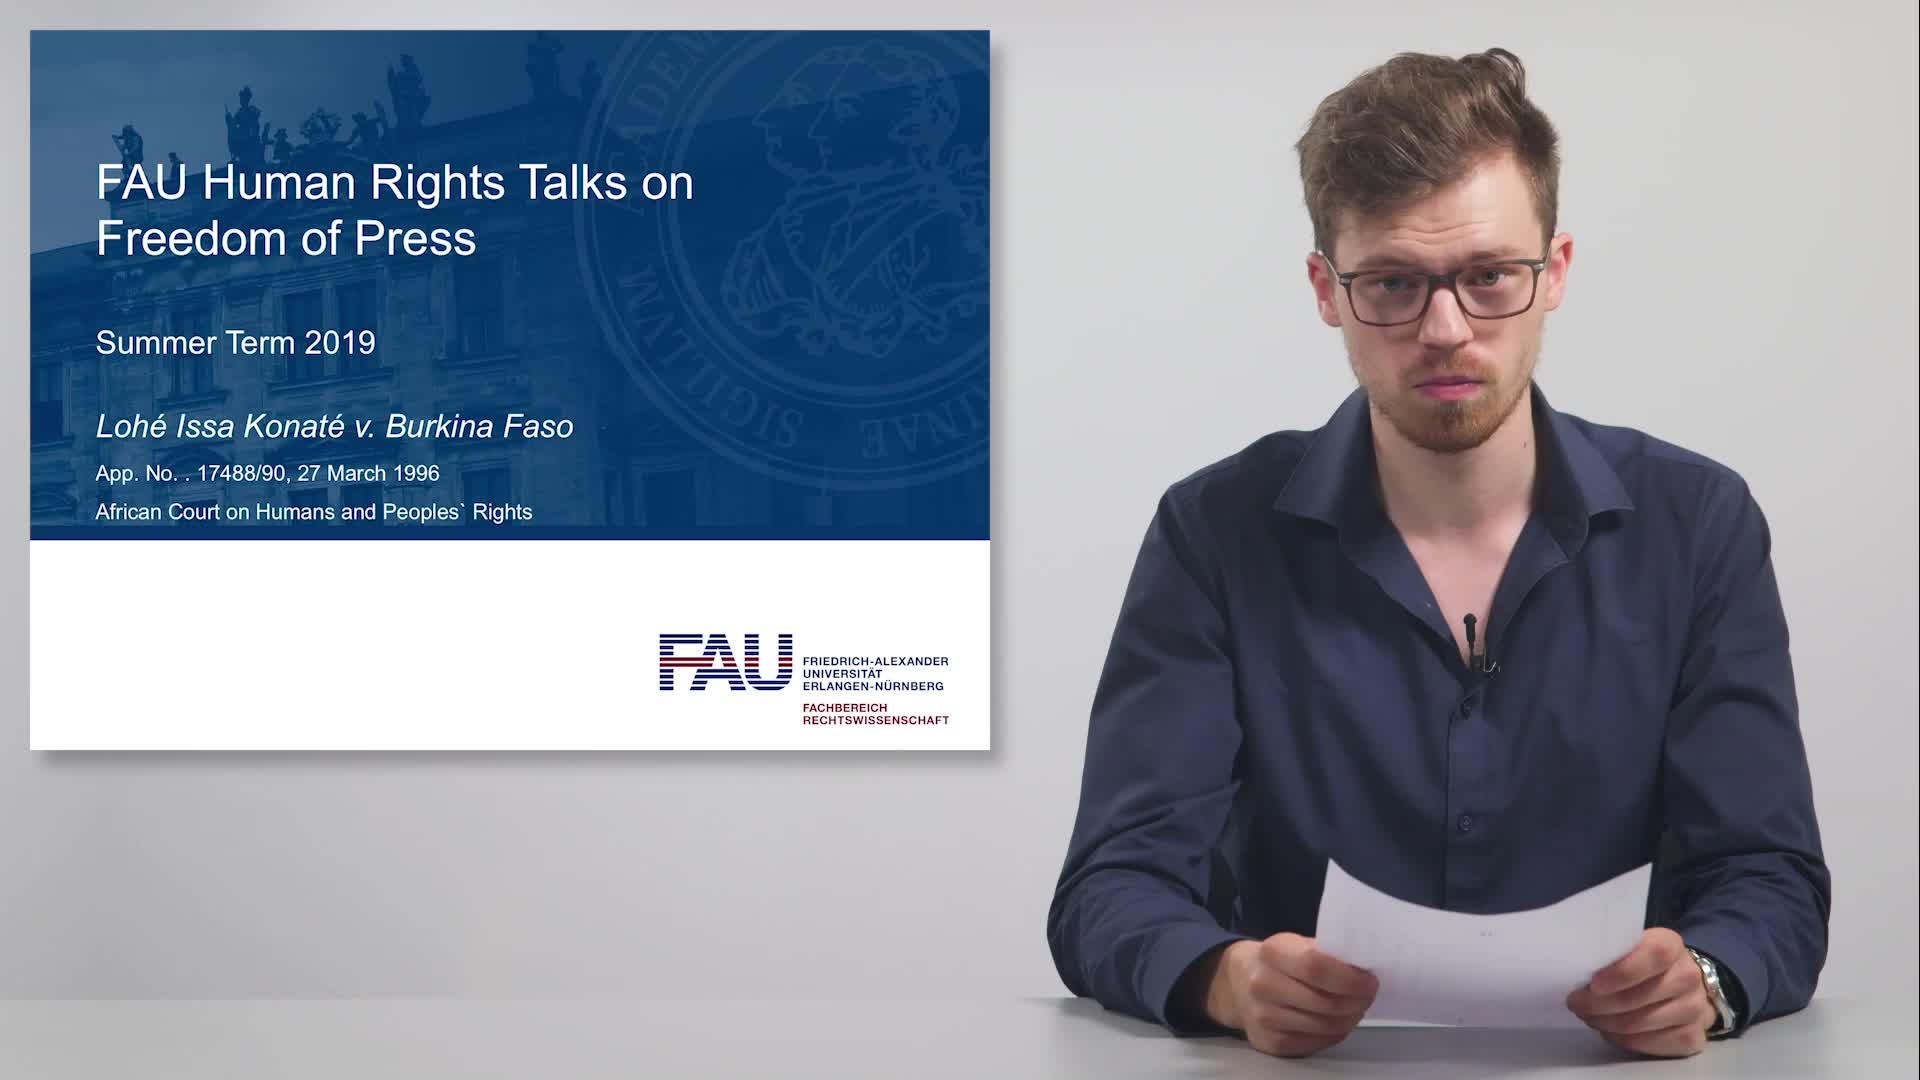 FAU Human Rights Talks – Summer Term 2019: Lohé Issa Konaté v. Burkina Faso preview image